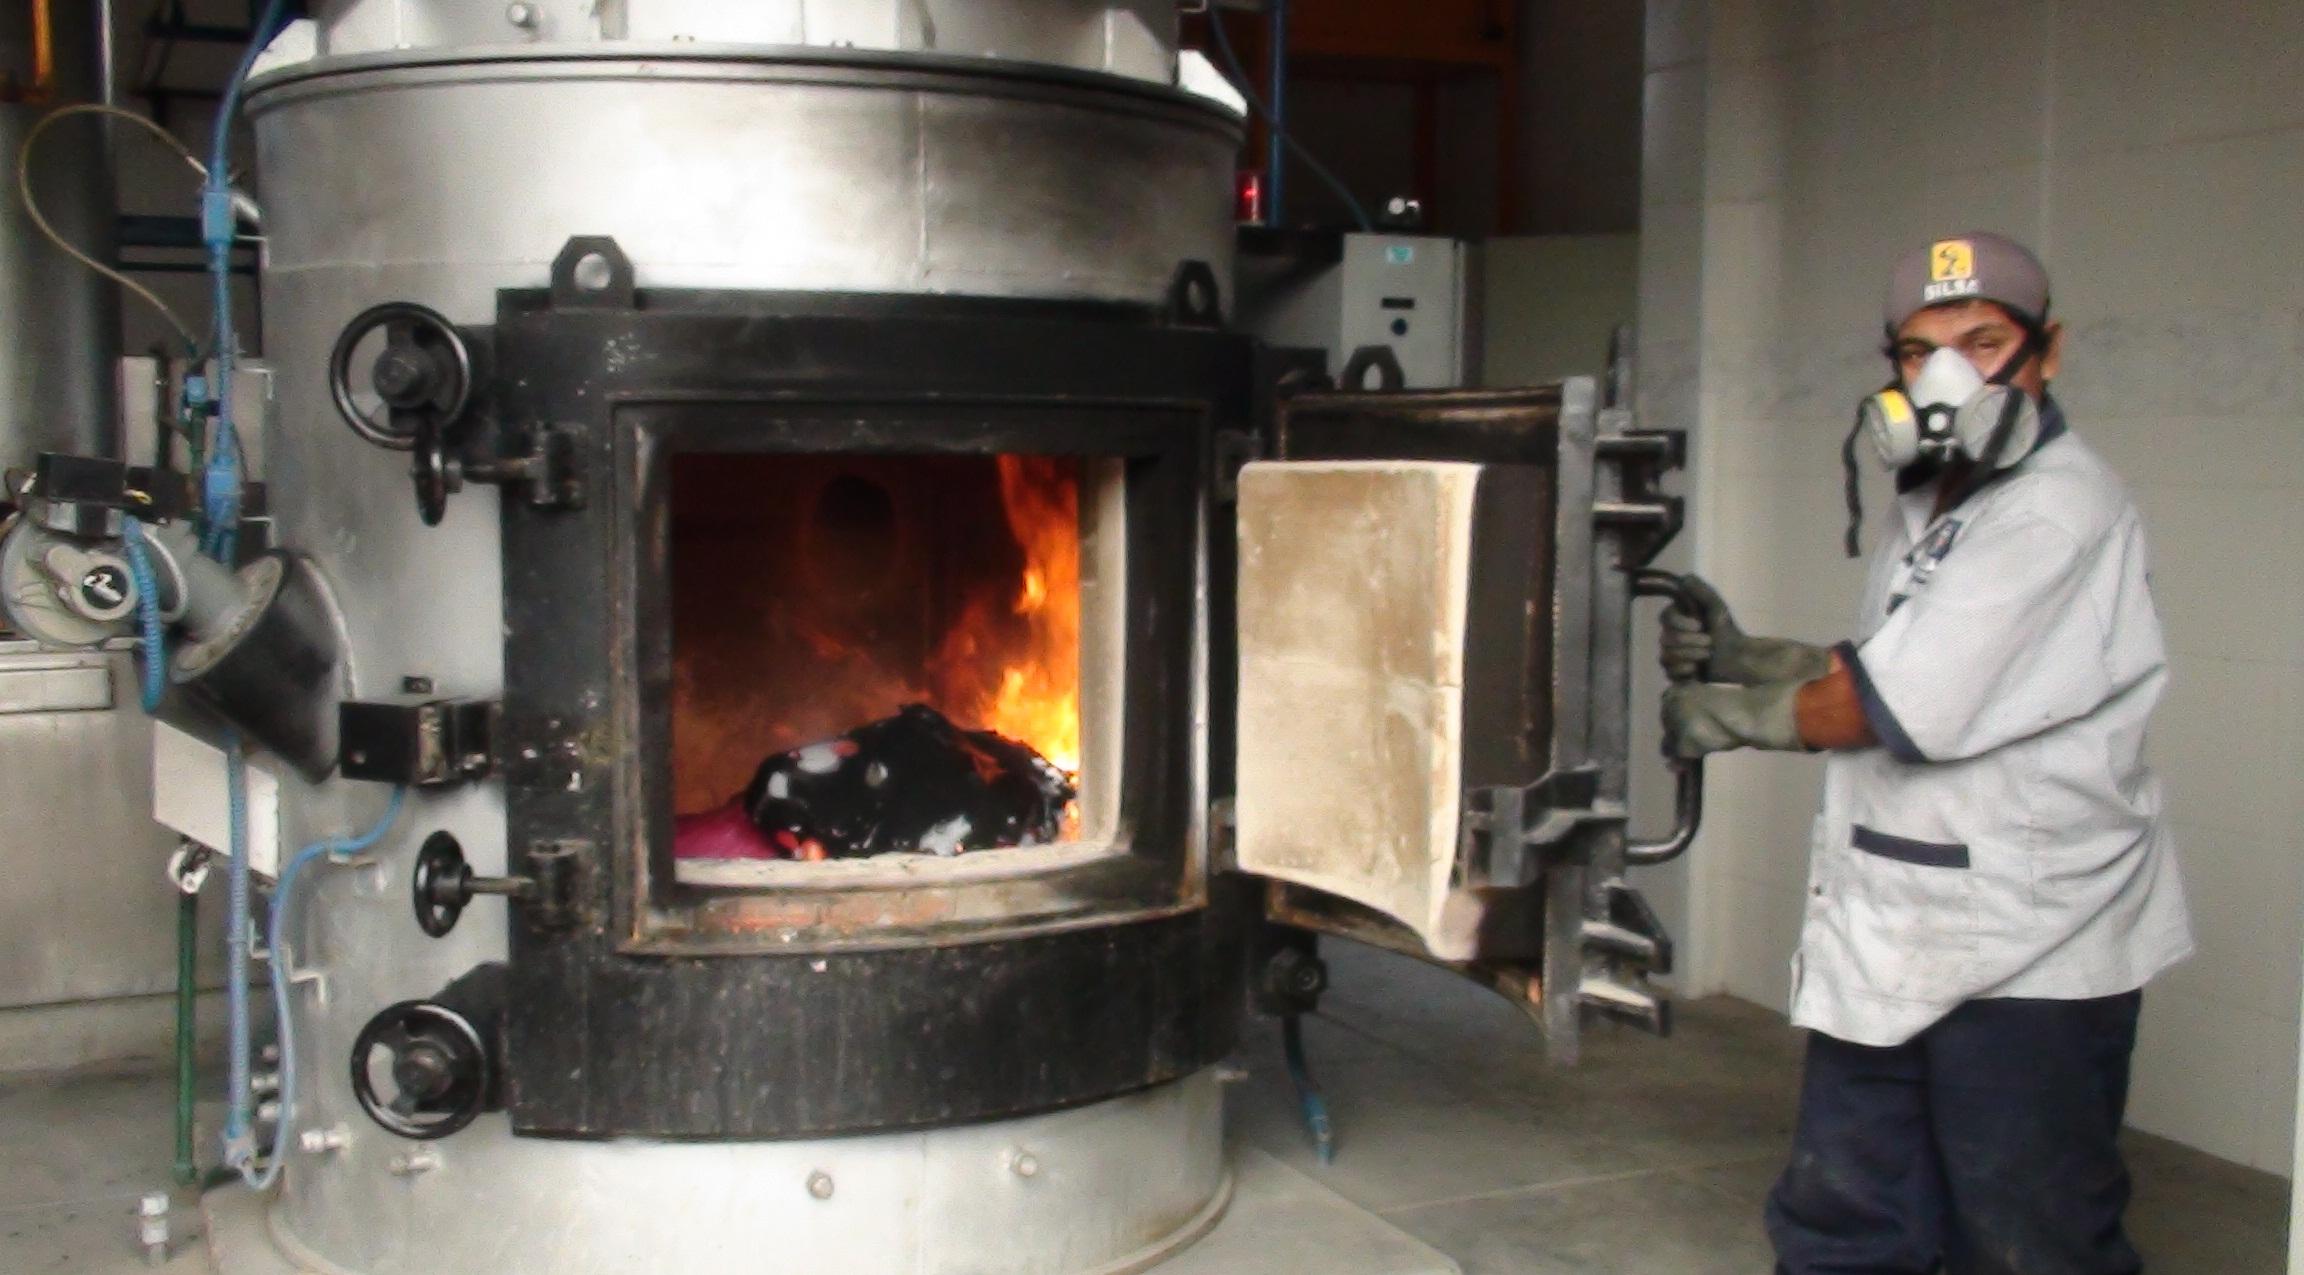 PAMA - Incinerador ESSALUD Piura - 2